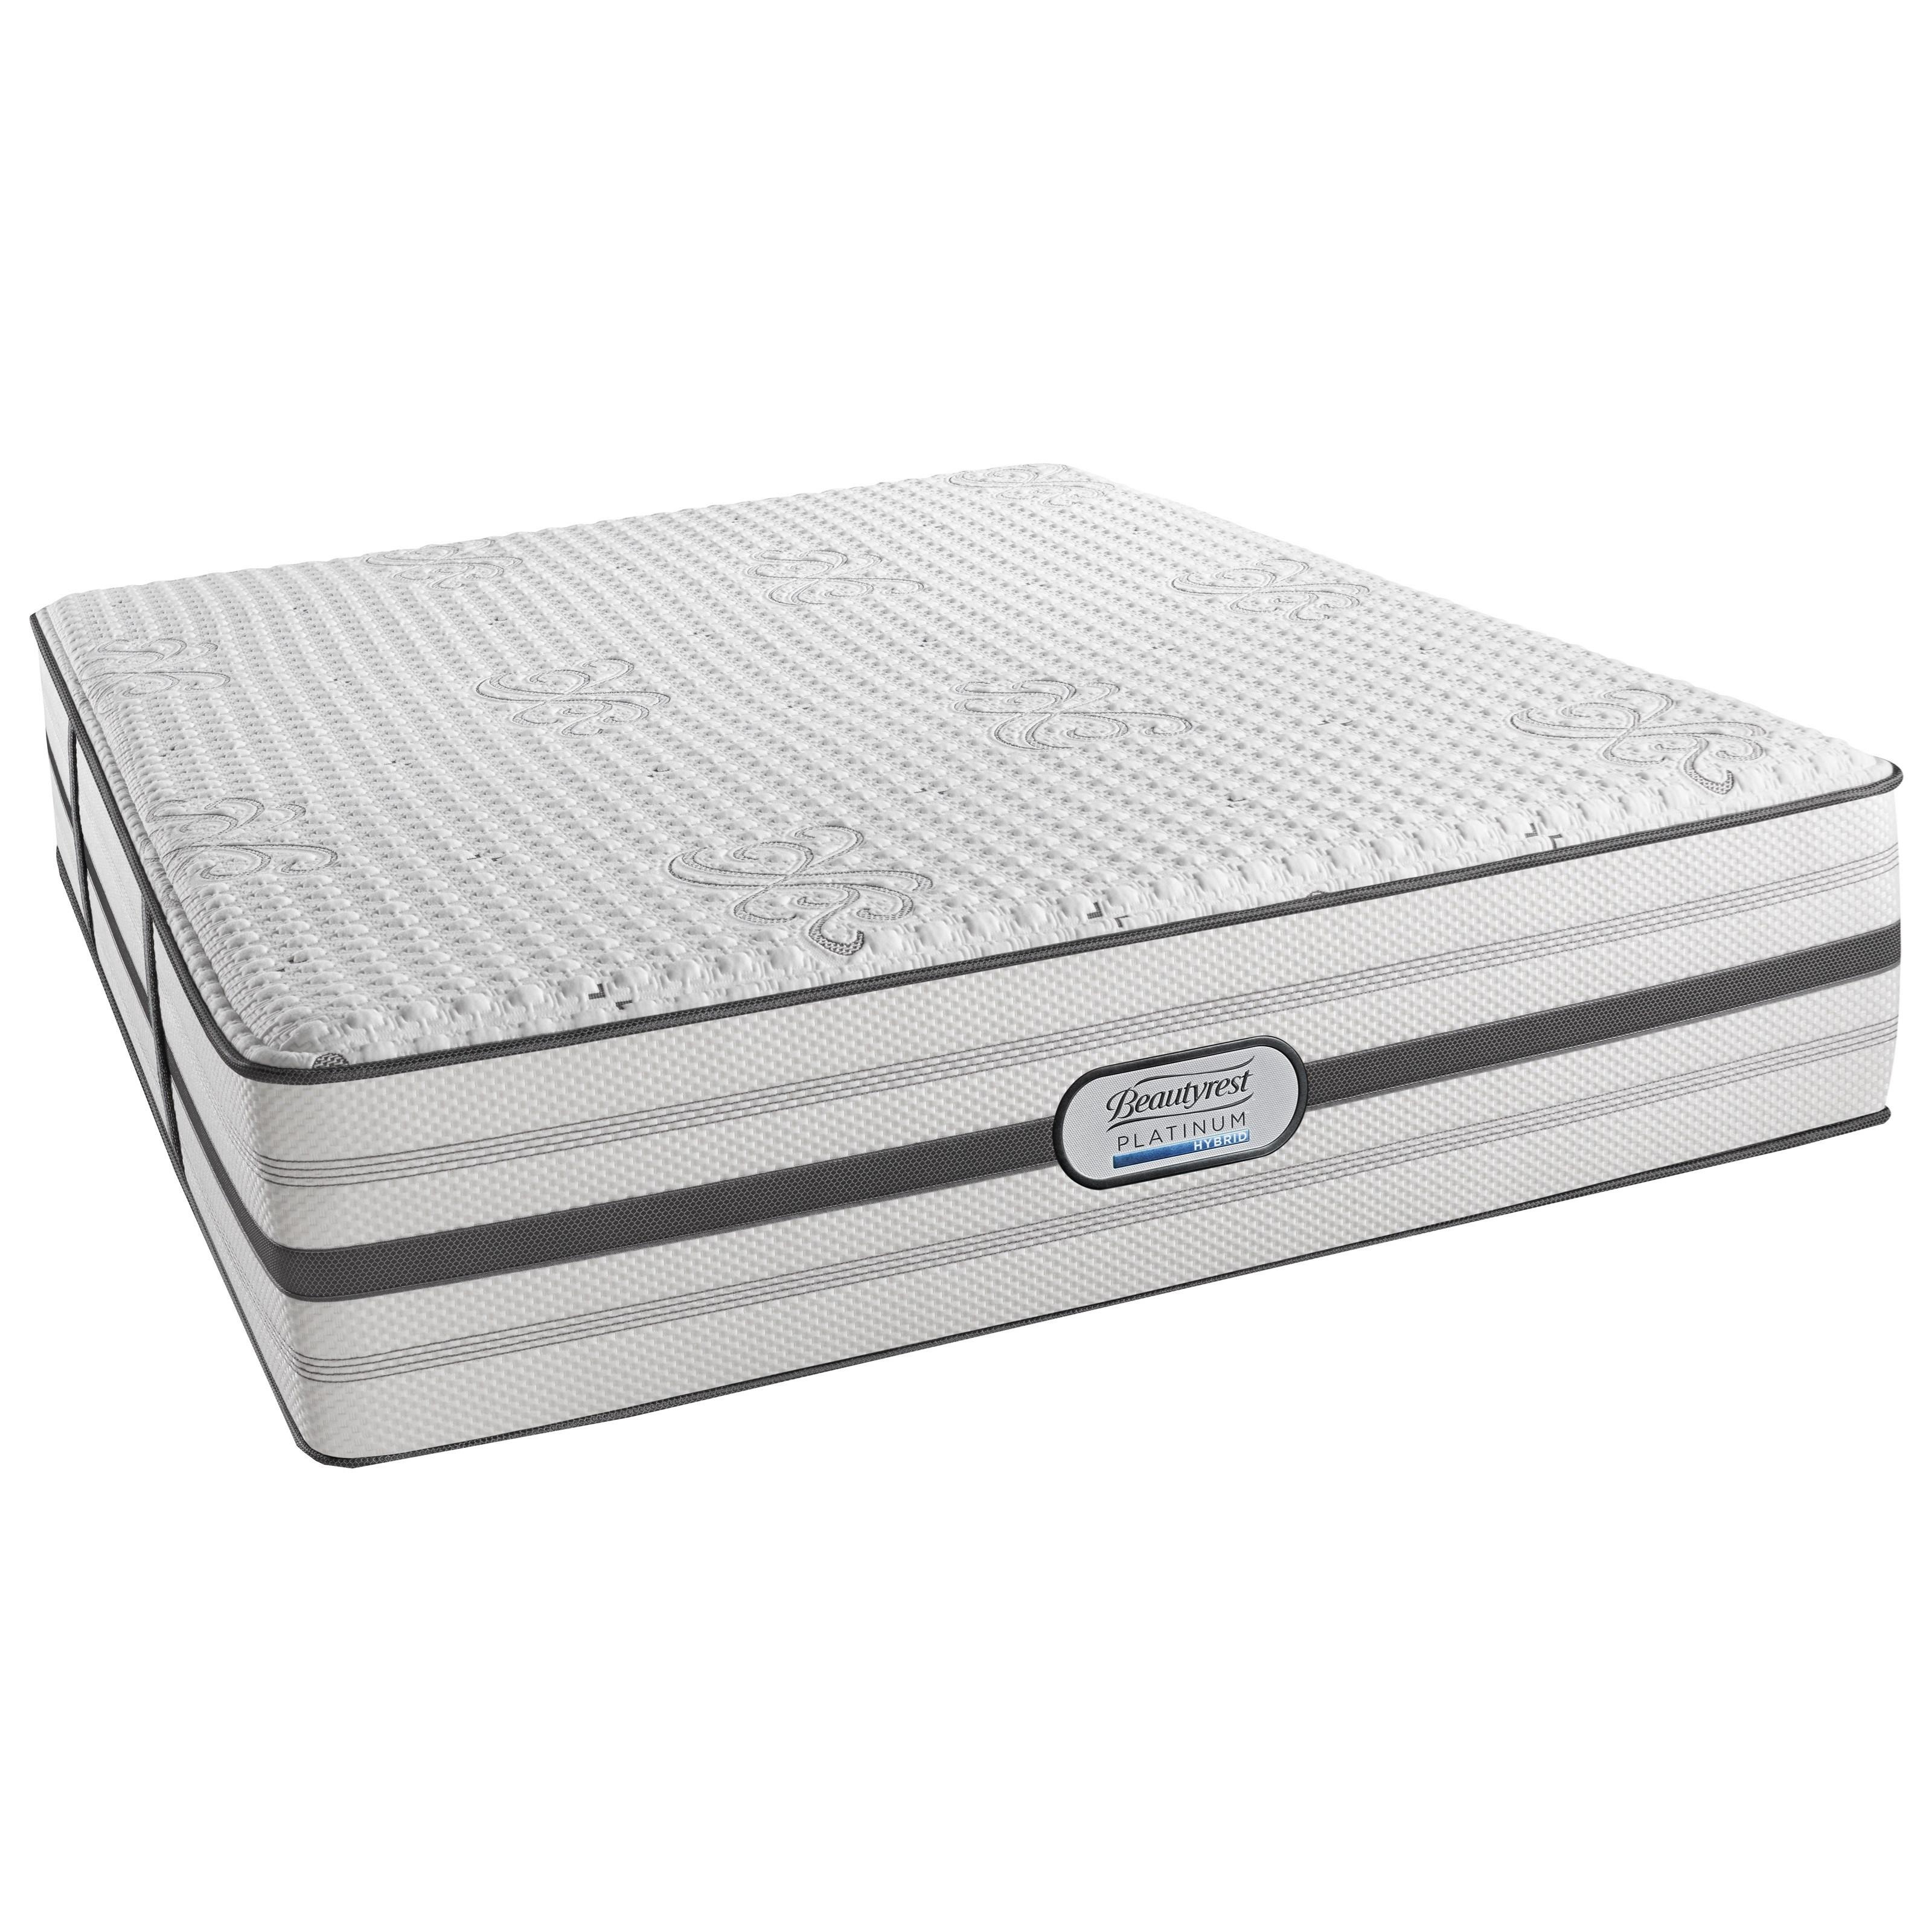 Beautyrest Platinum Austin Cal King Luxury Firm Adjustable Set - Item Number: BRHLV1LF-CK+2xSM1-SPCK